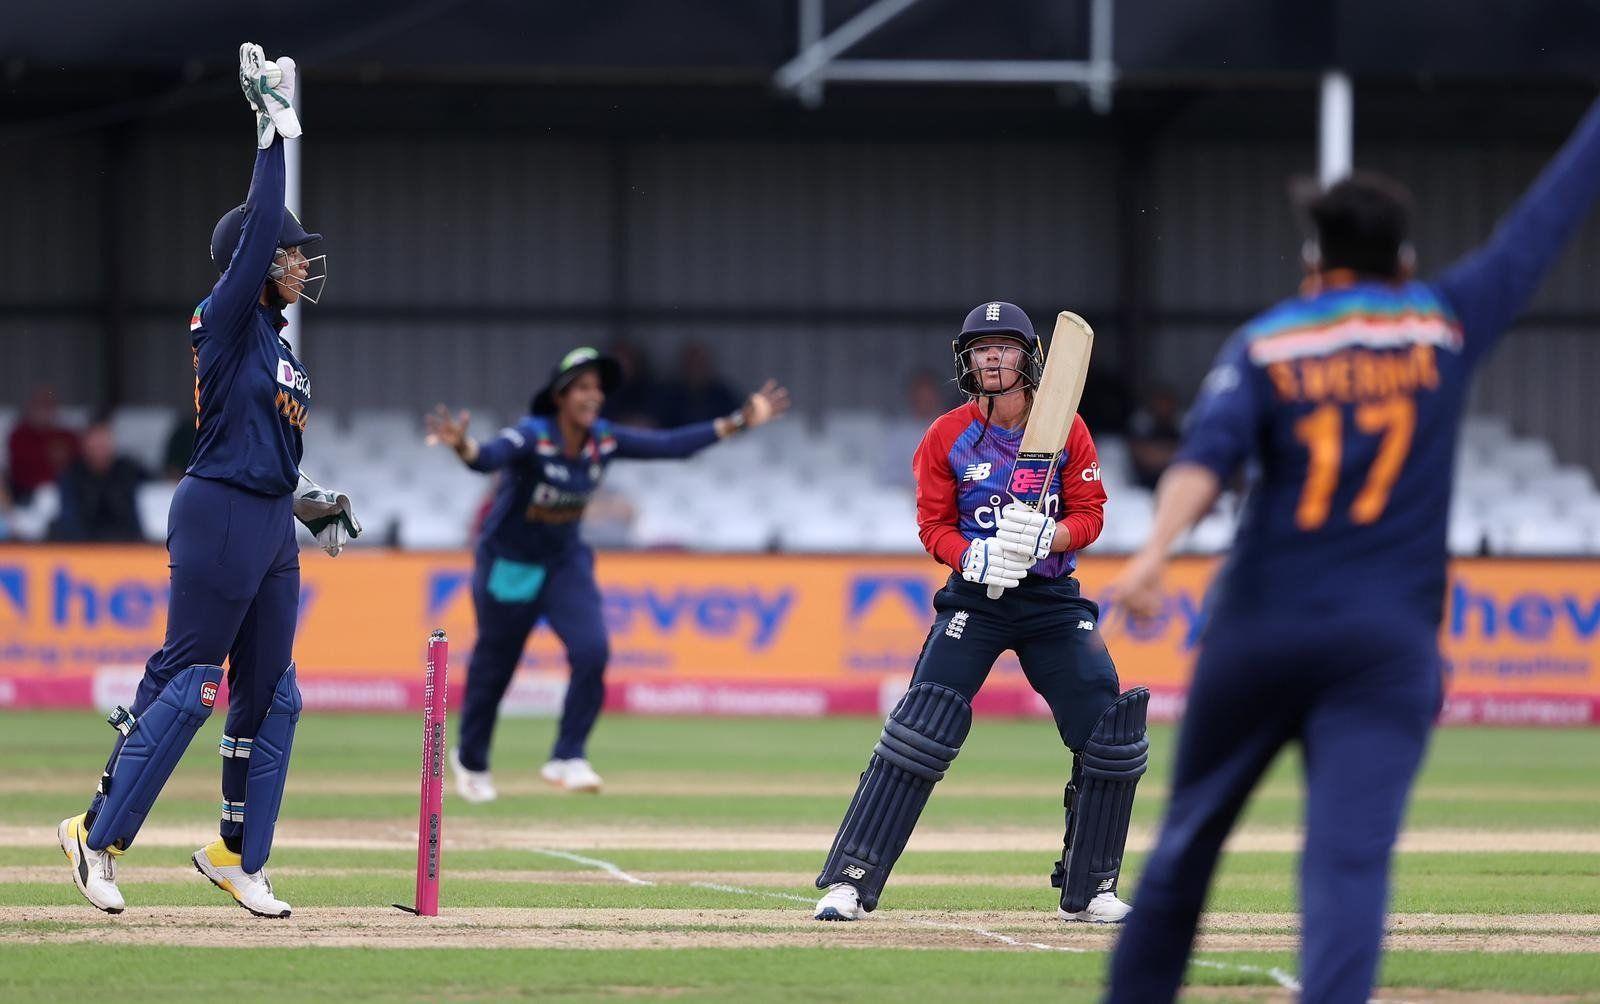 Match Highlights India Women vs England Women, 2nd T20I: IND W Beat ENG W  By 8 Runs, Level Series 1-1